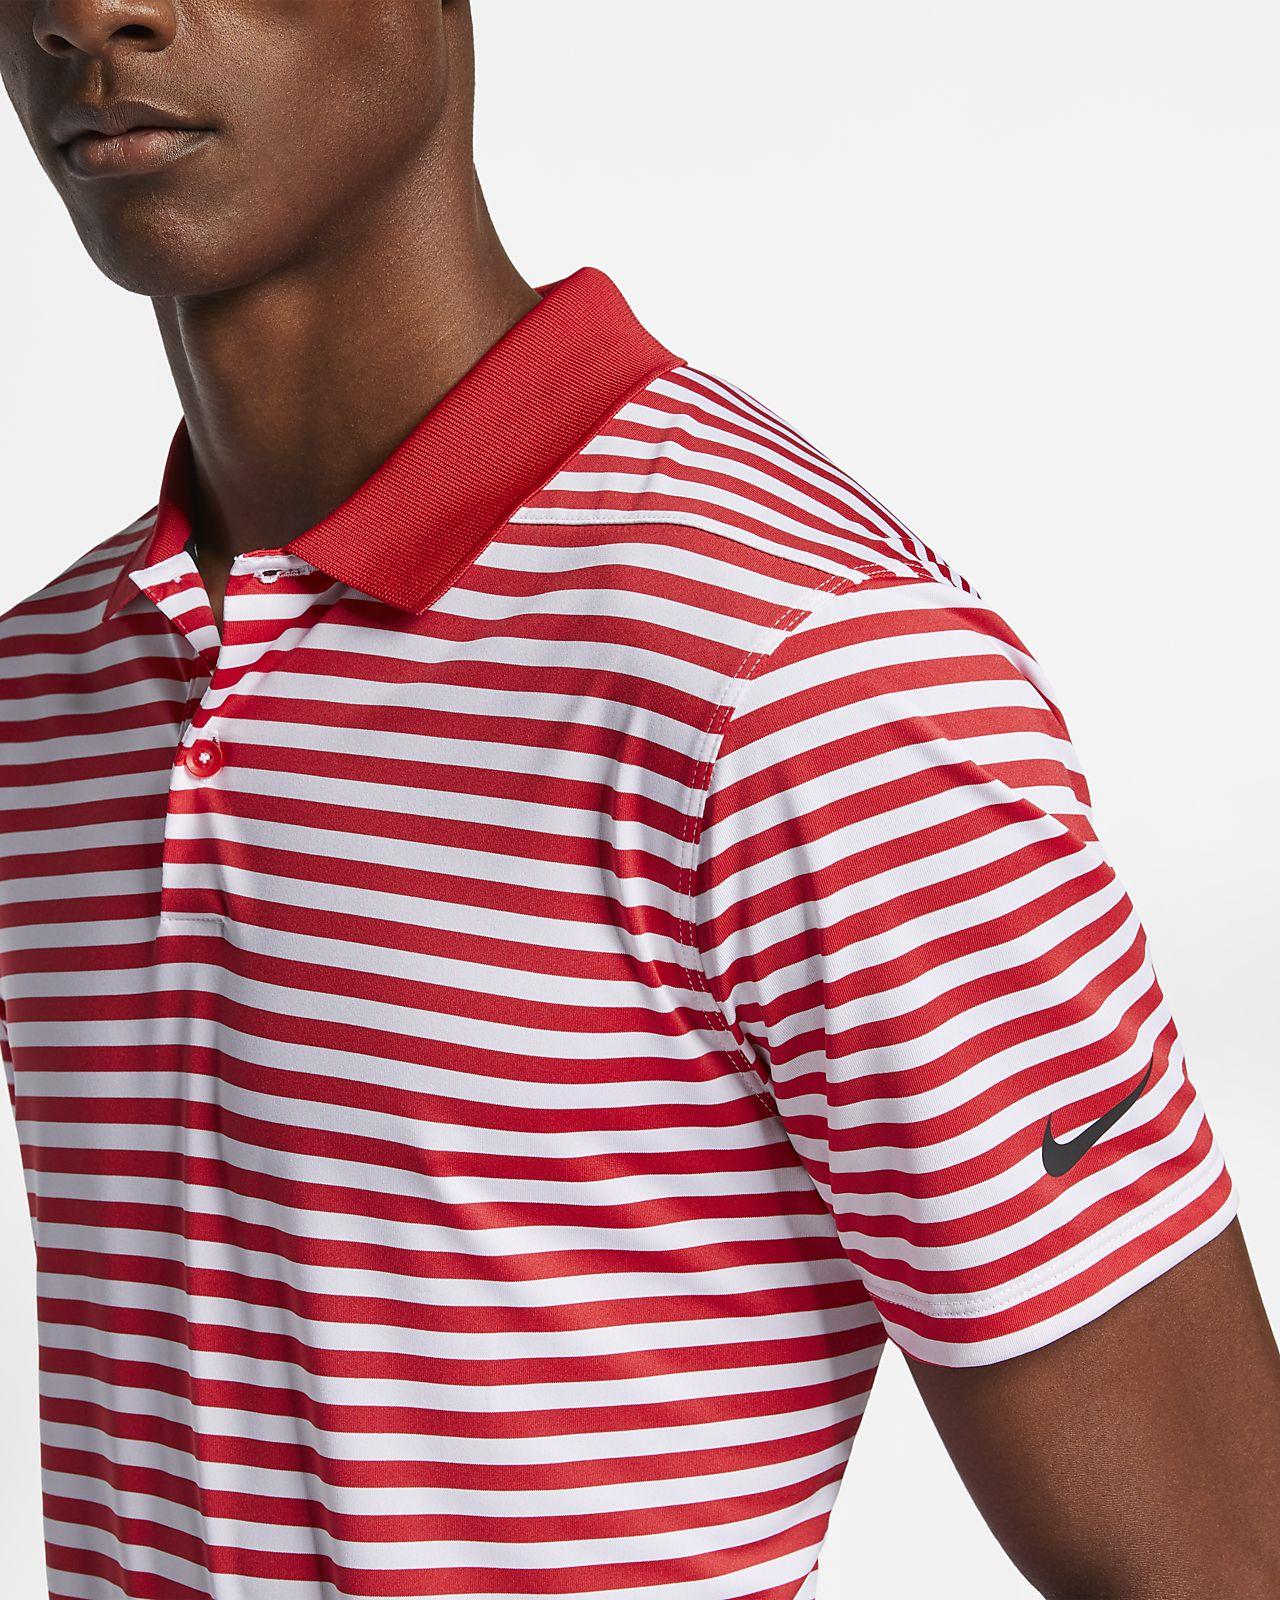 e7ee1ee242 Nike Dri-FIT Victory Men's Striped Golf Polo. Nike.com